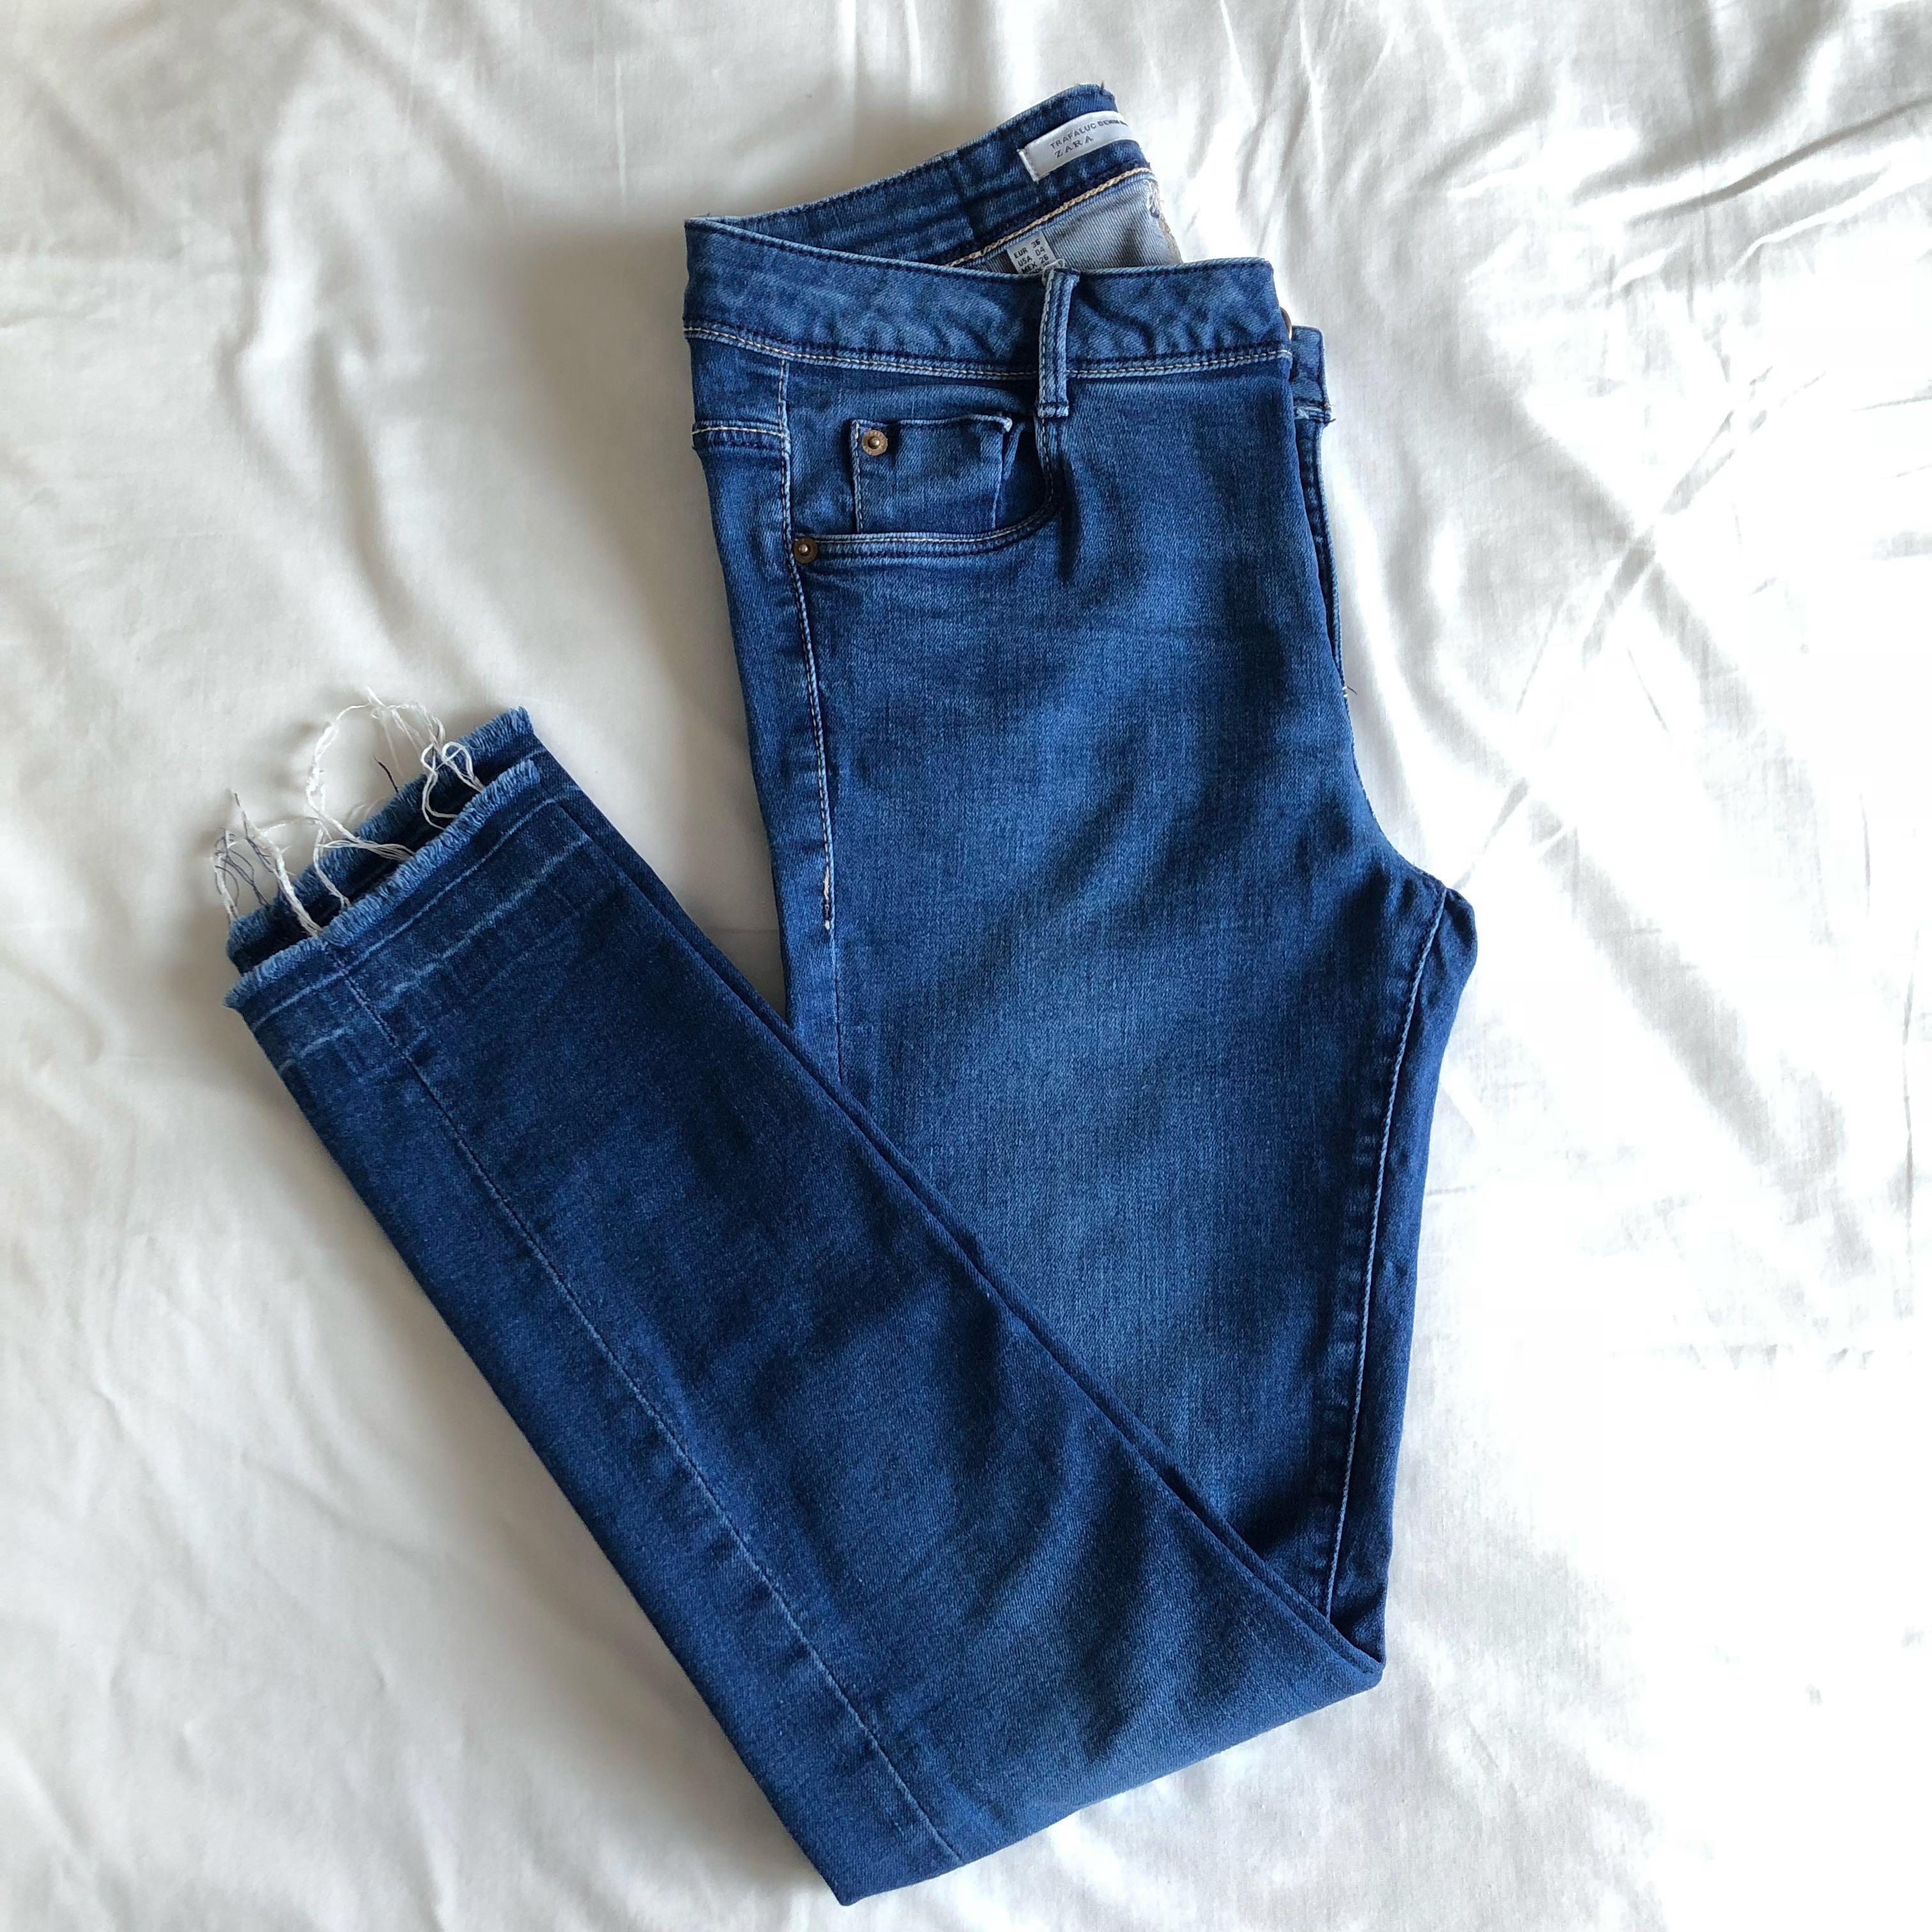 c079014b WOMENS JEANS (ZARA TRF), Women's Fashion, Clothes, Pants, Jeans ...